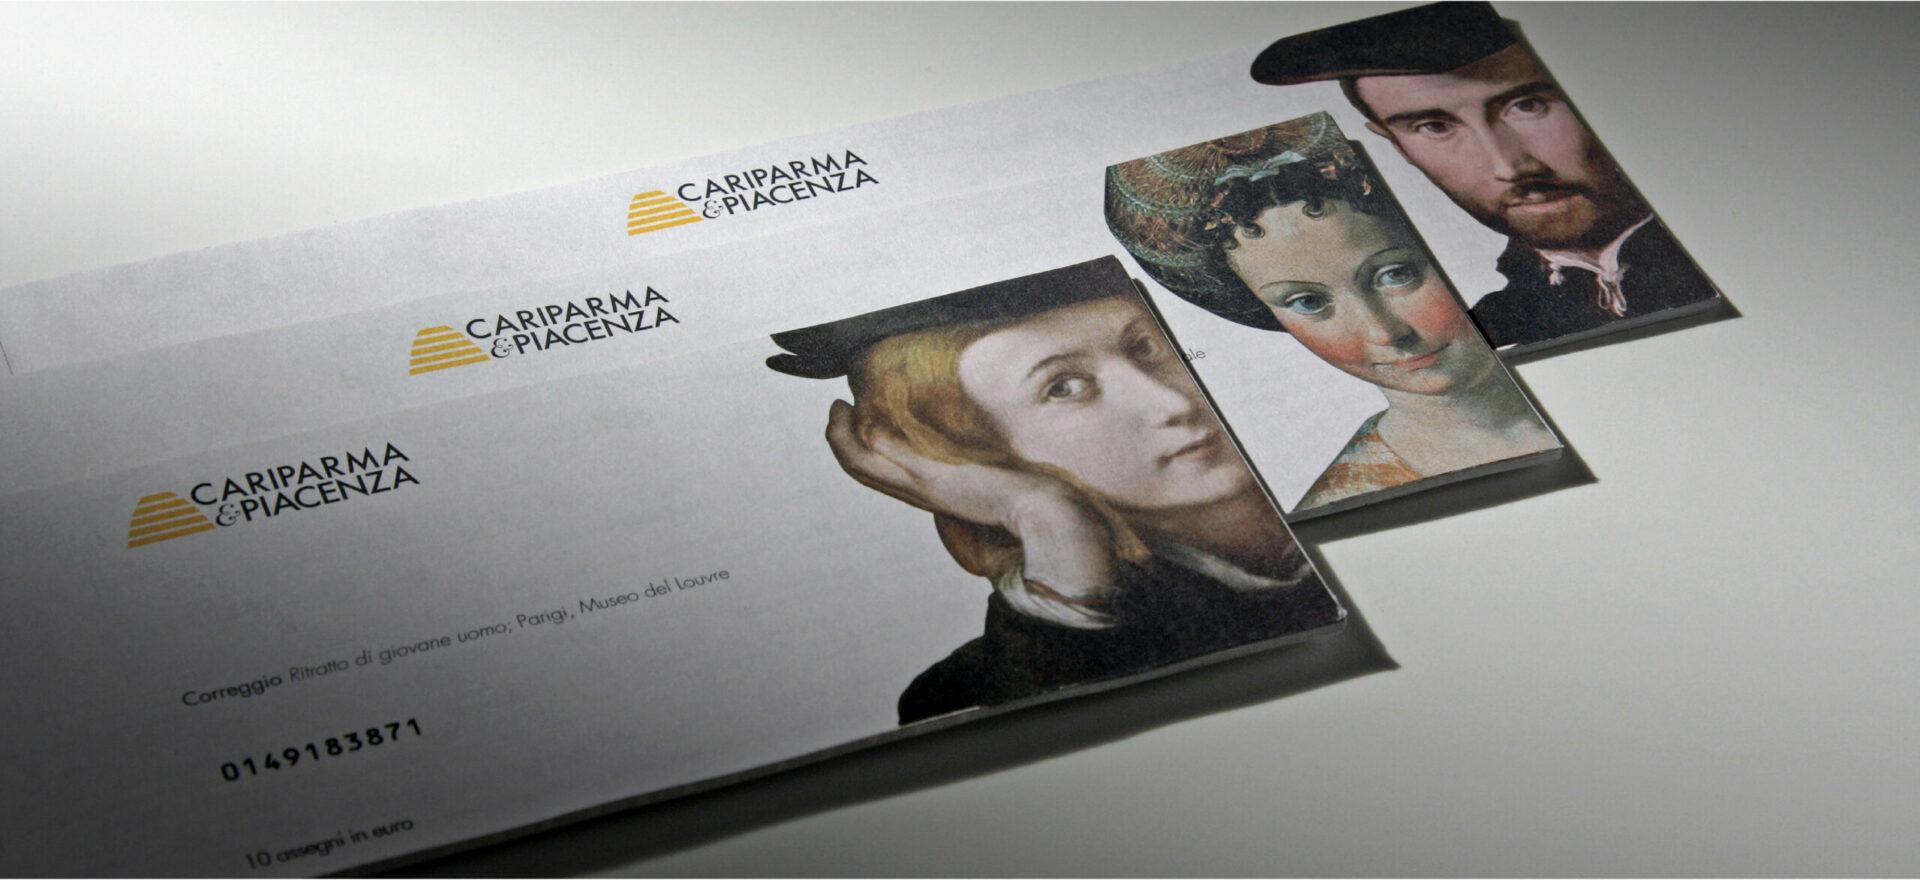 Checks | Graphic Design | Branding | Cariparma | Mario Trimarchi Design | Fragile